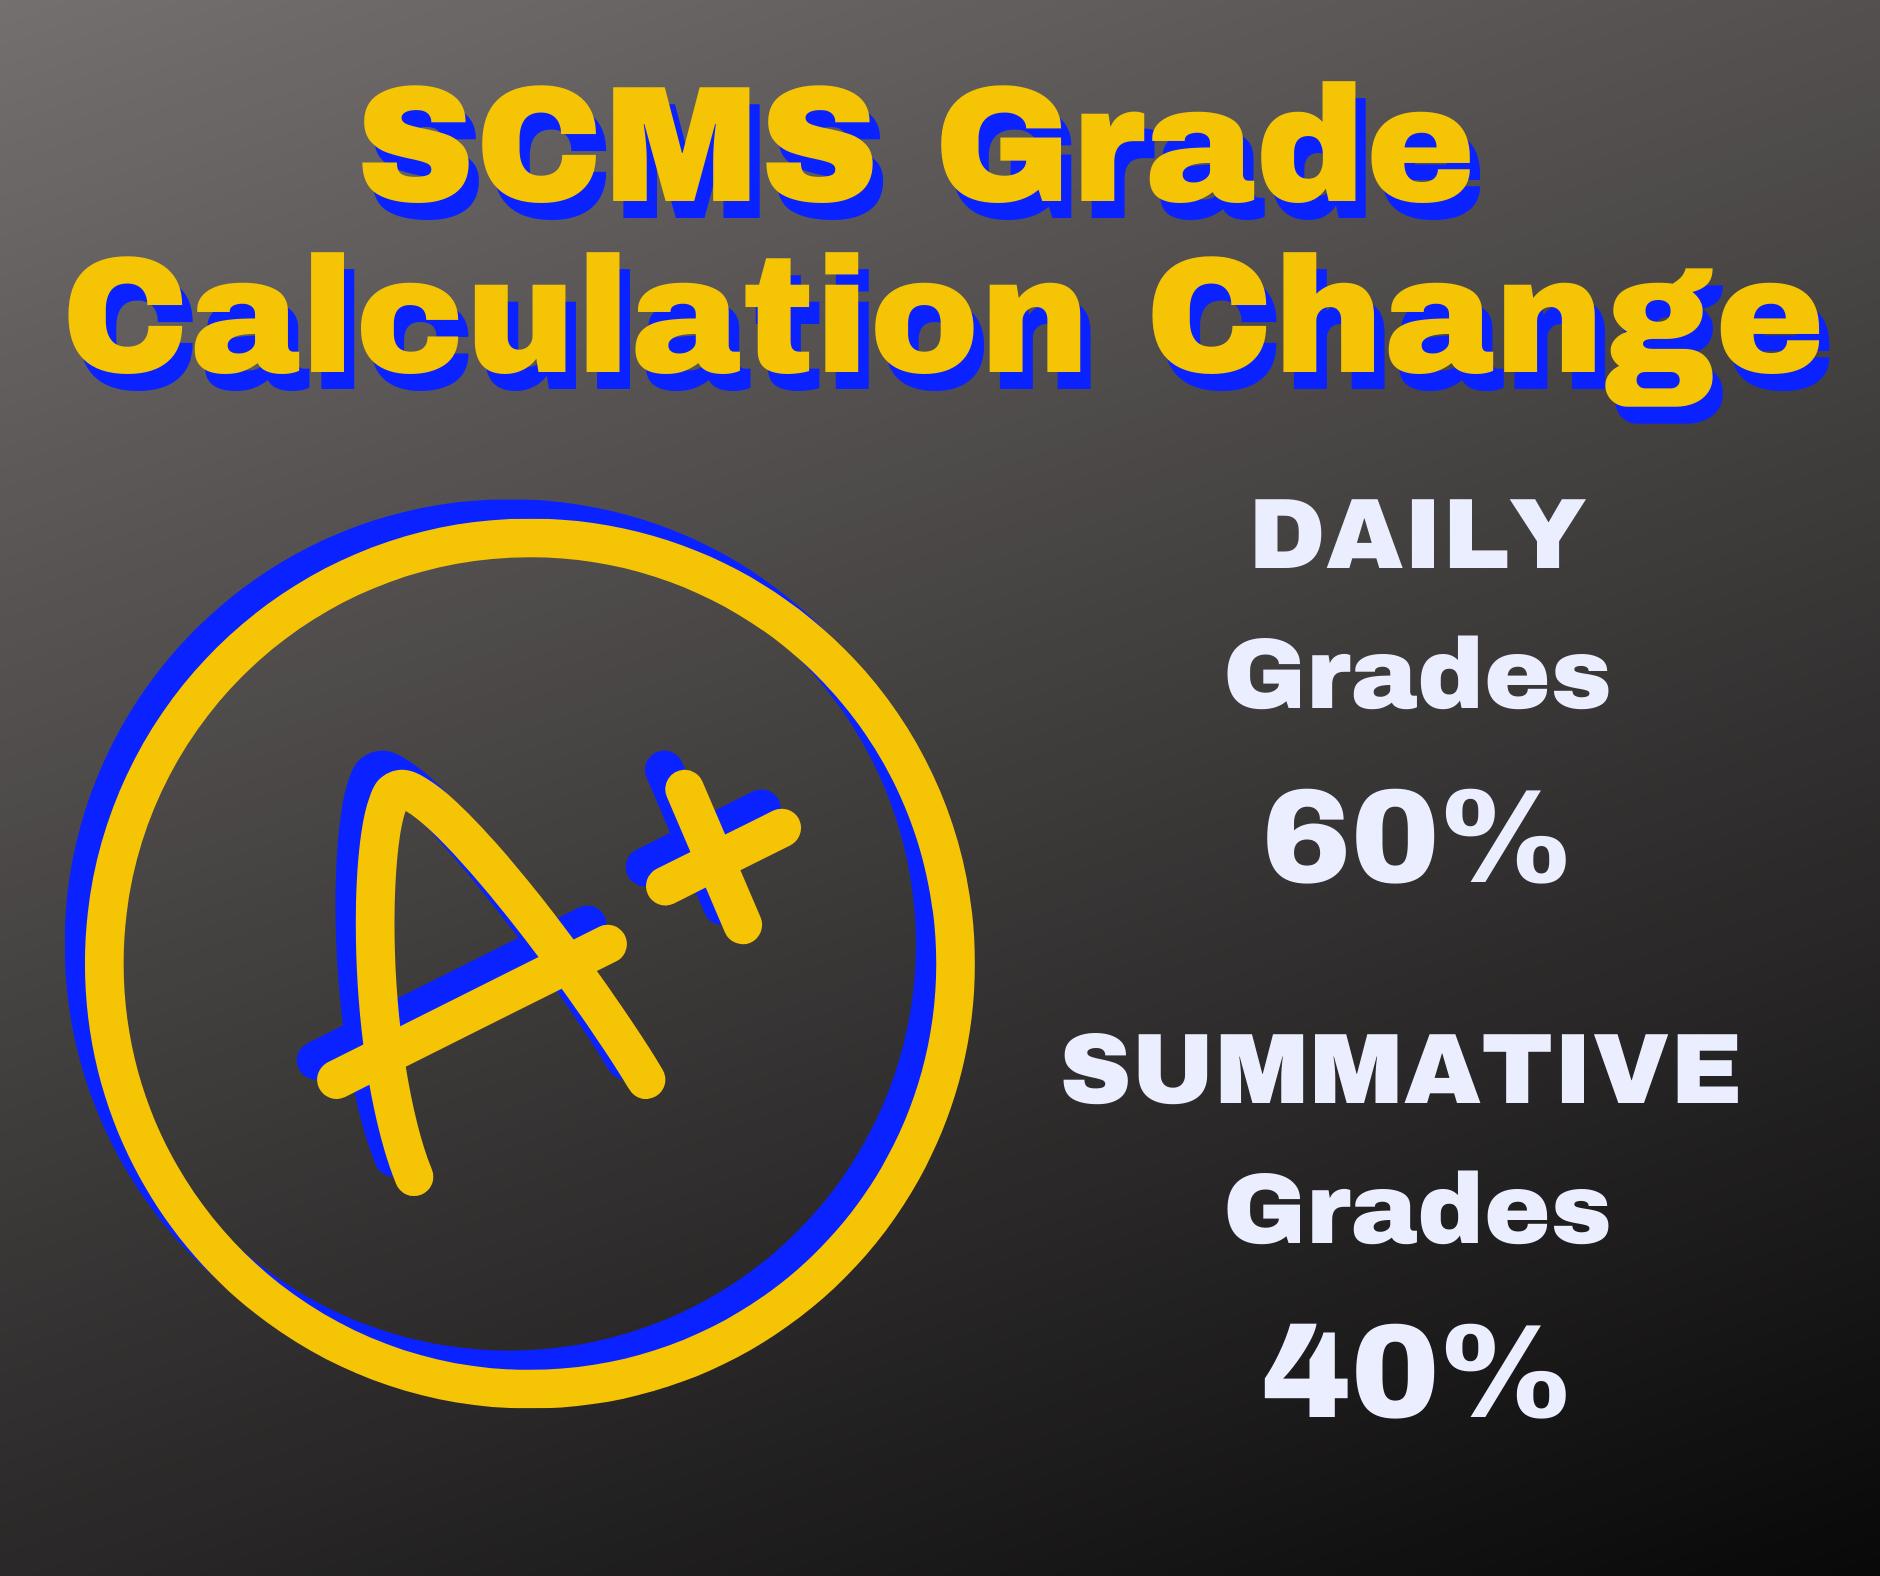 Grade Calculation Change